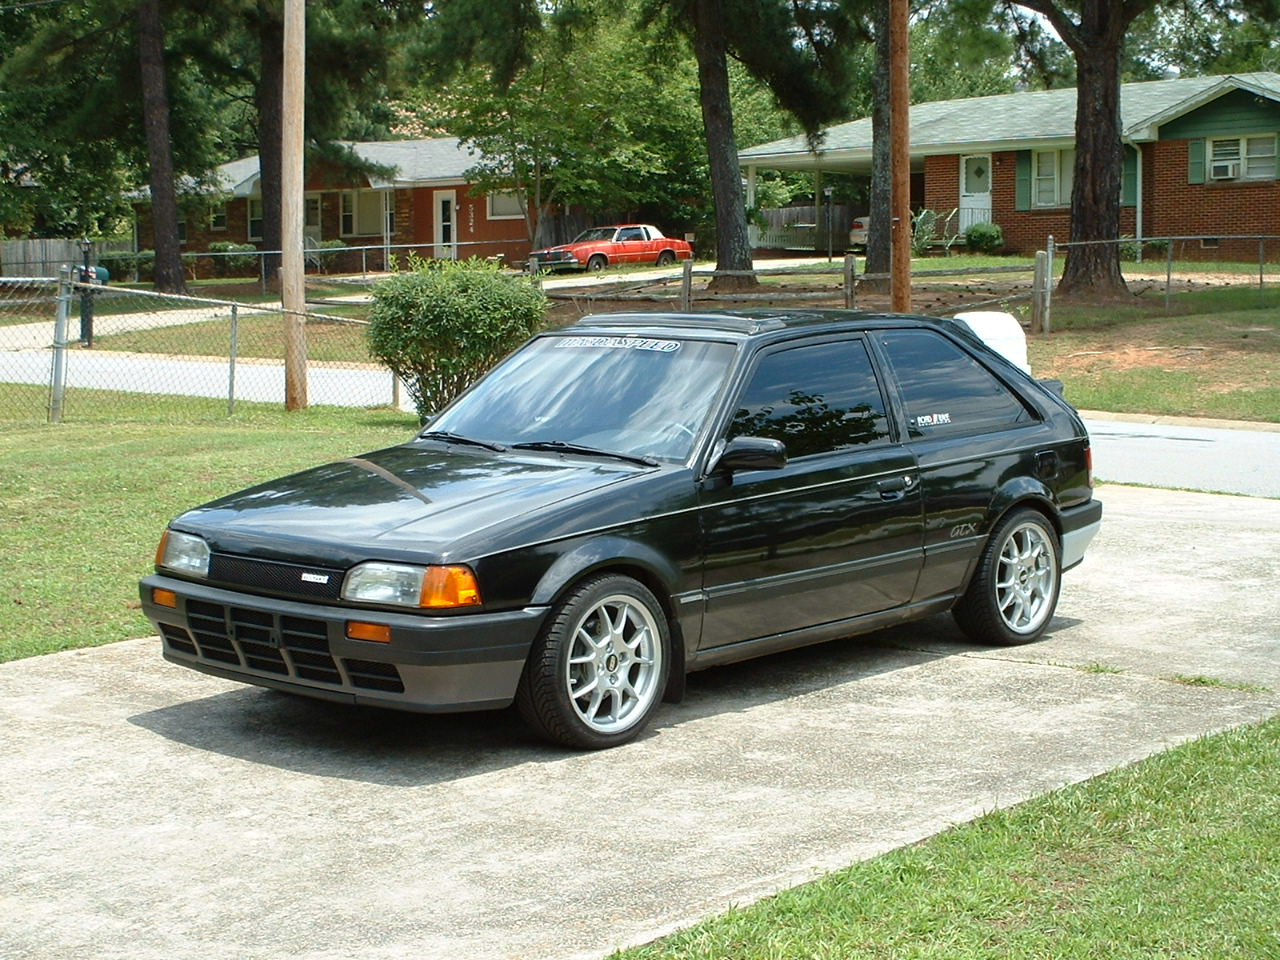 Mazda 323 gtx for sale craigslist